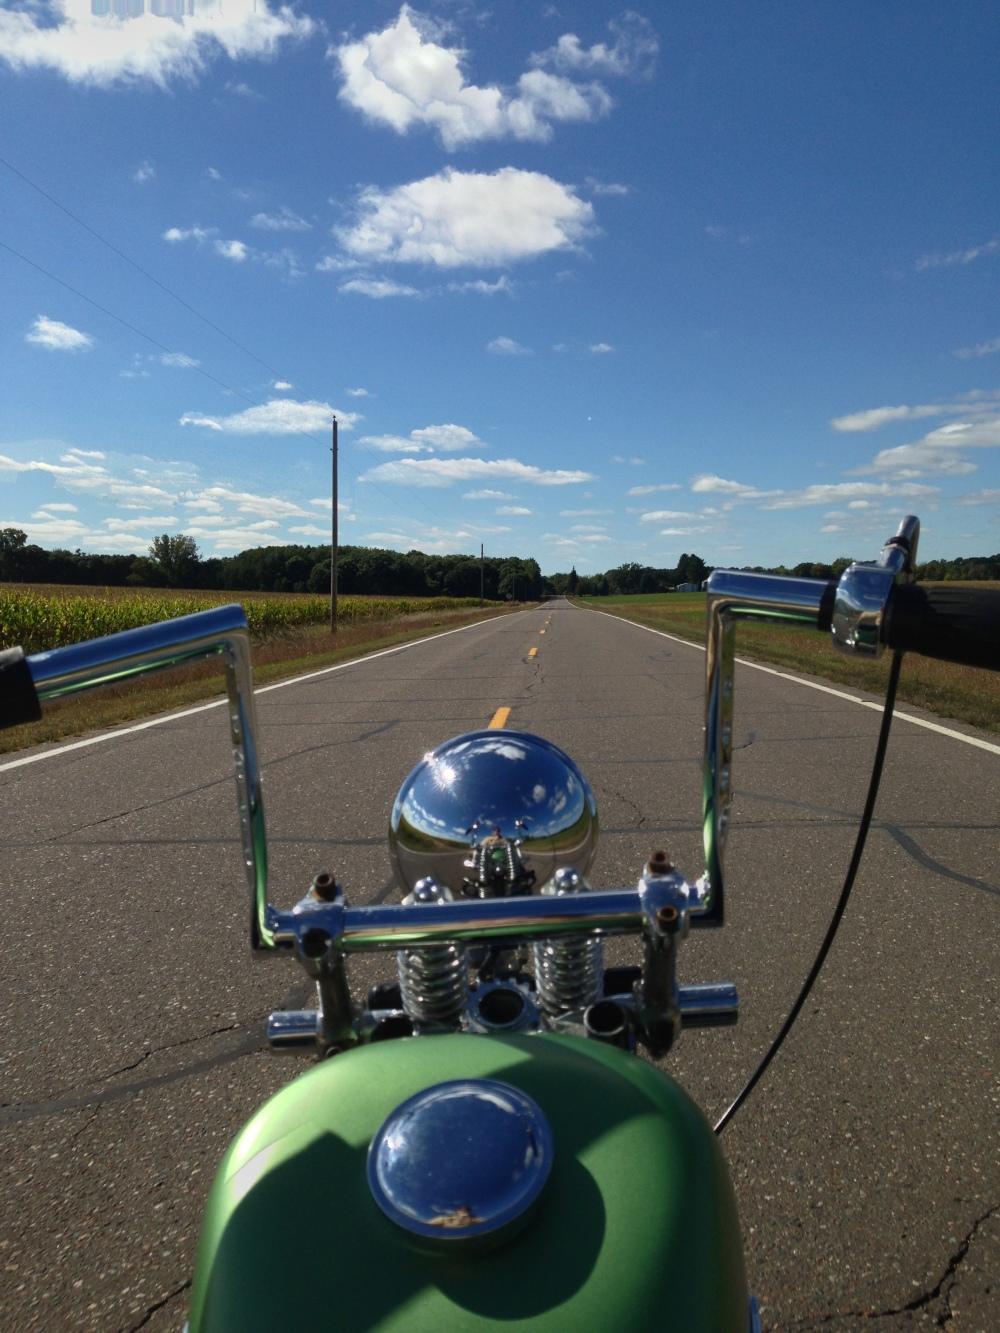 Harley Davidson Chopper Open Road